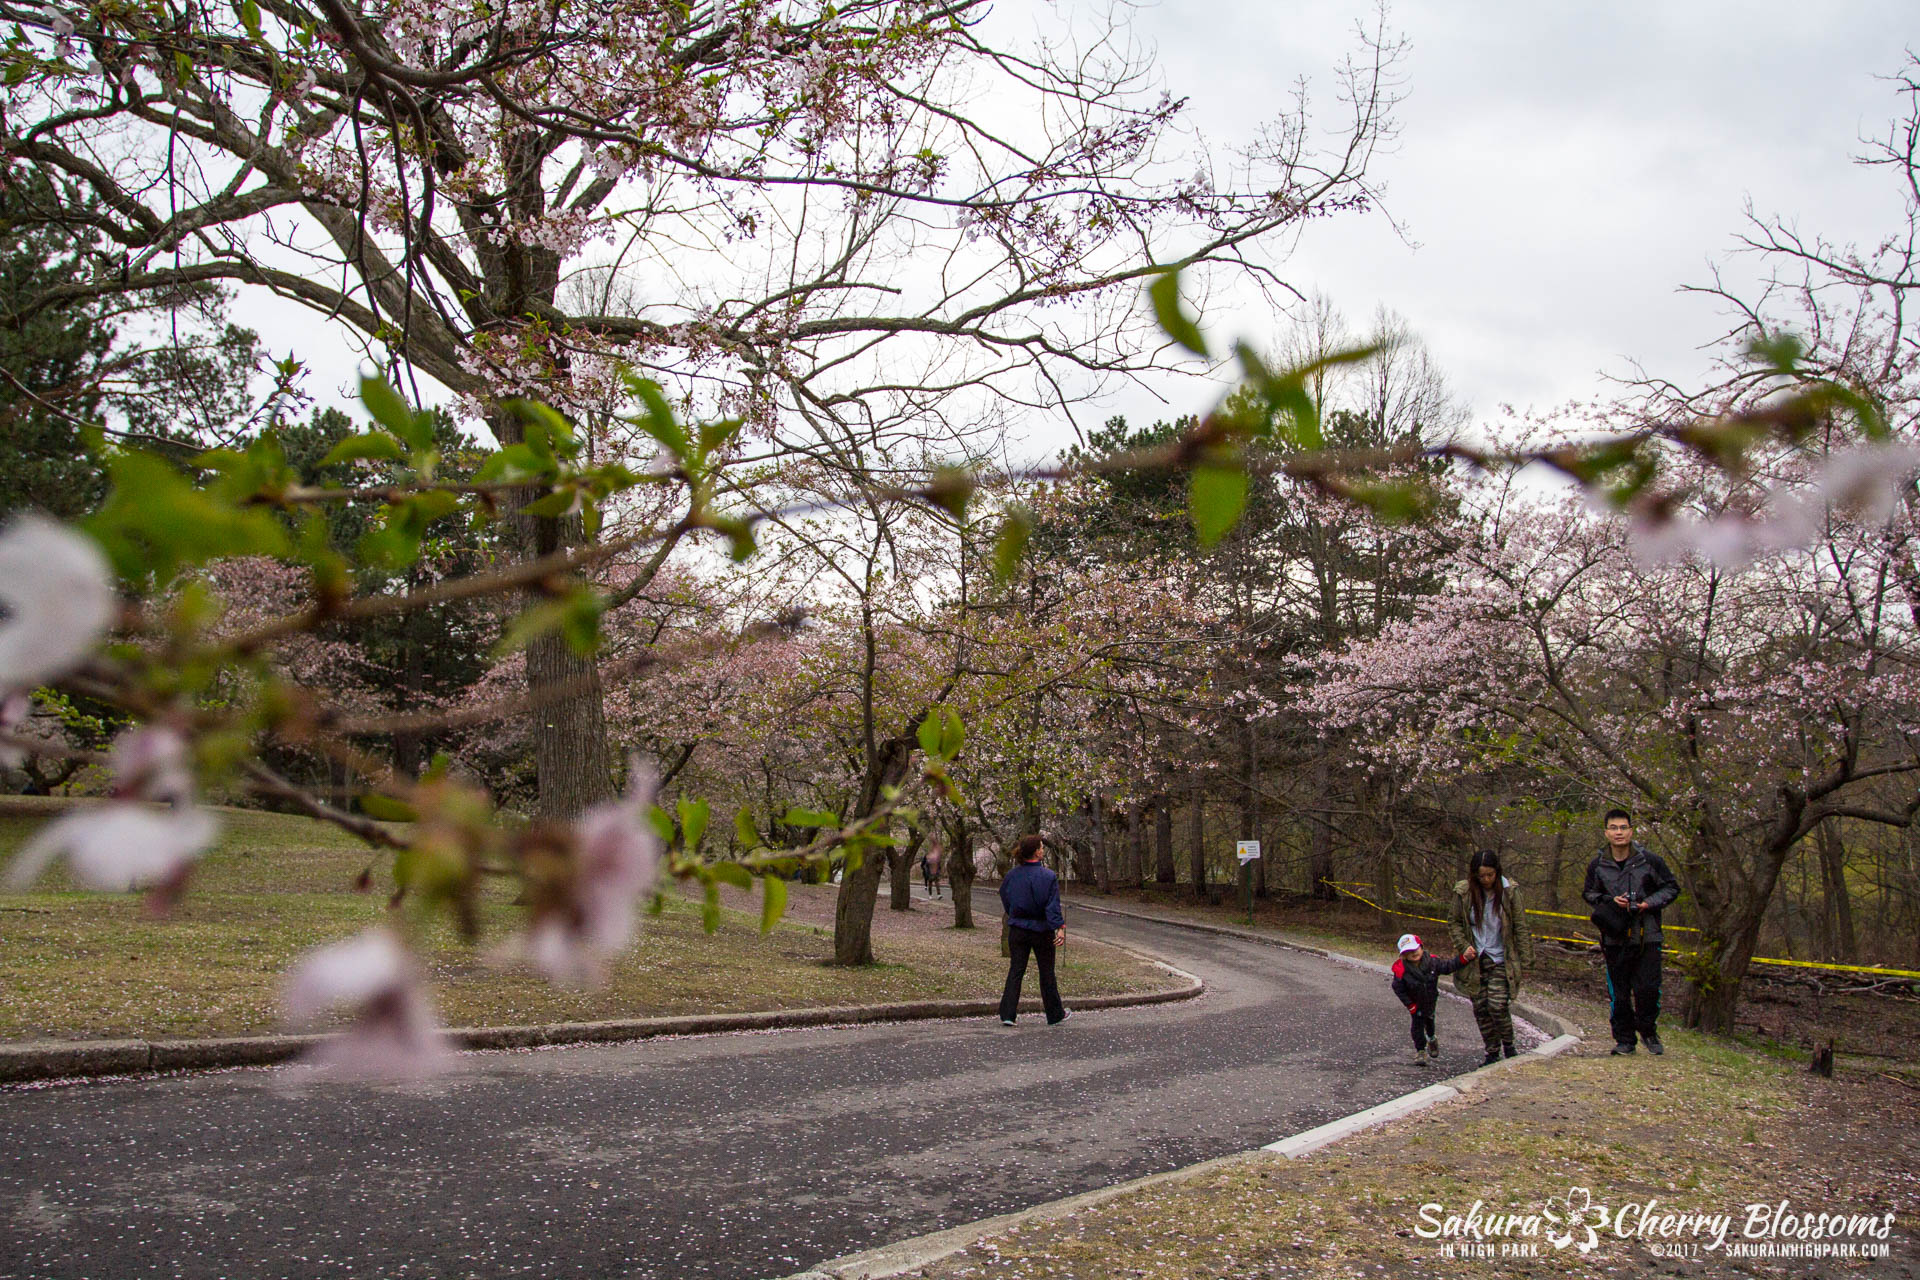 Sakura-Watch-May-2-2017-cherry-blossoms-falling-in-High-Park-88.jpg